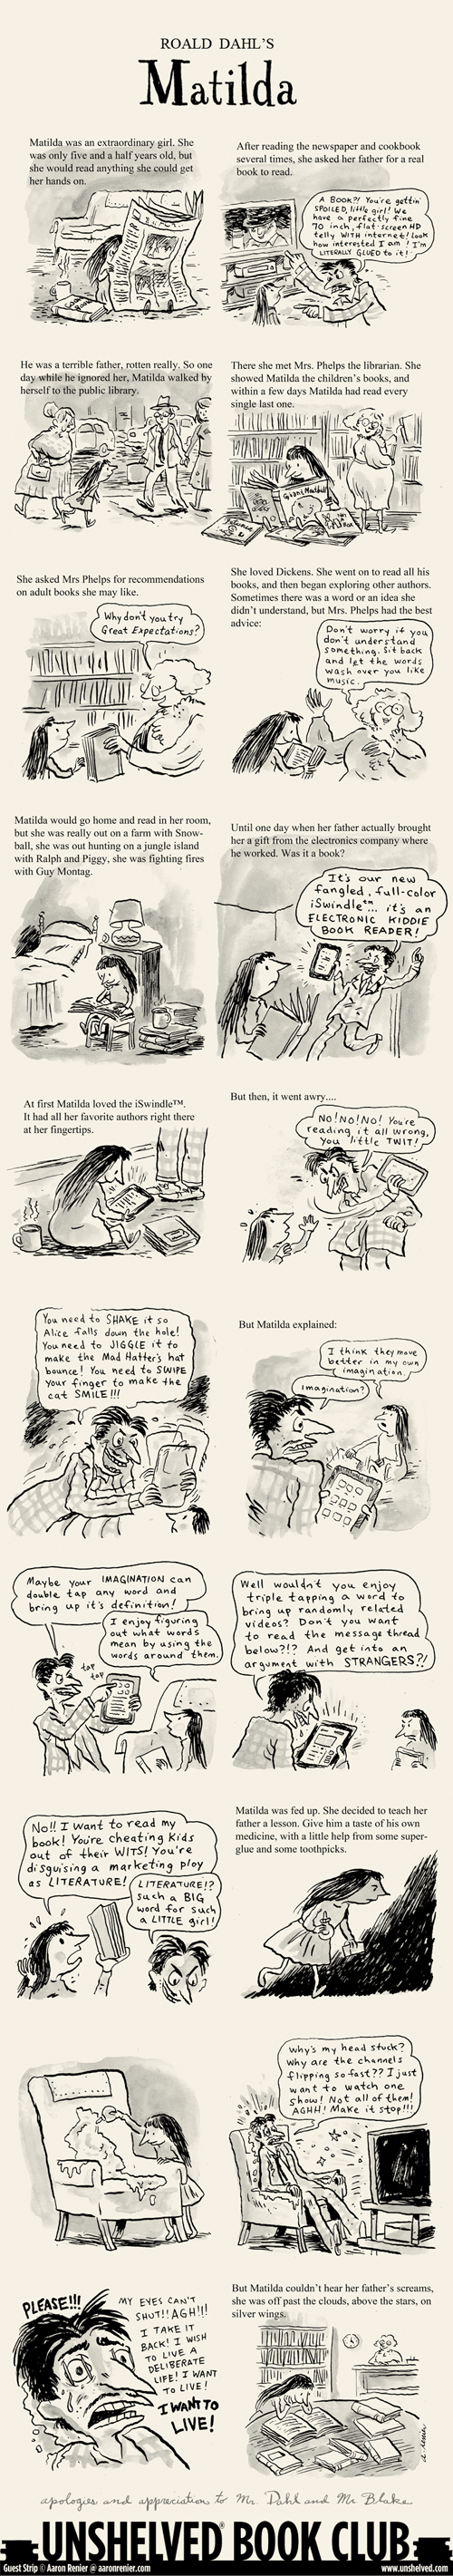 Matilda vs The E-Reader